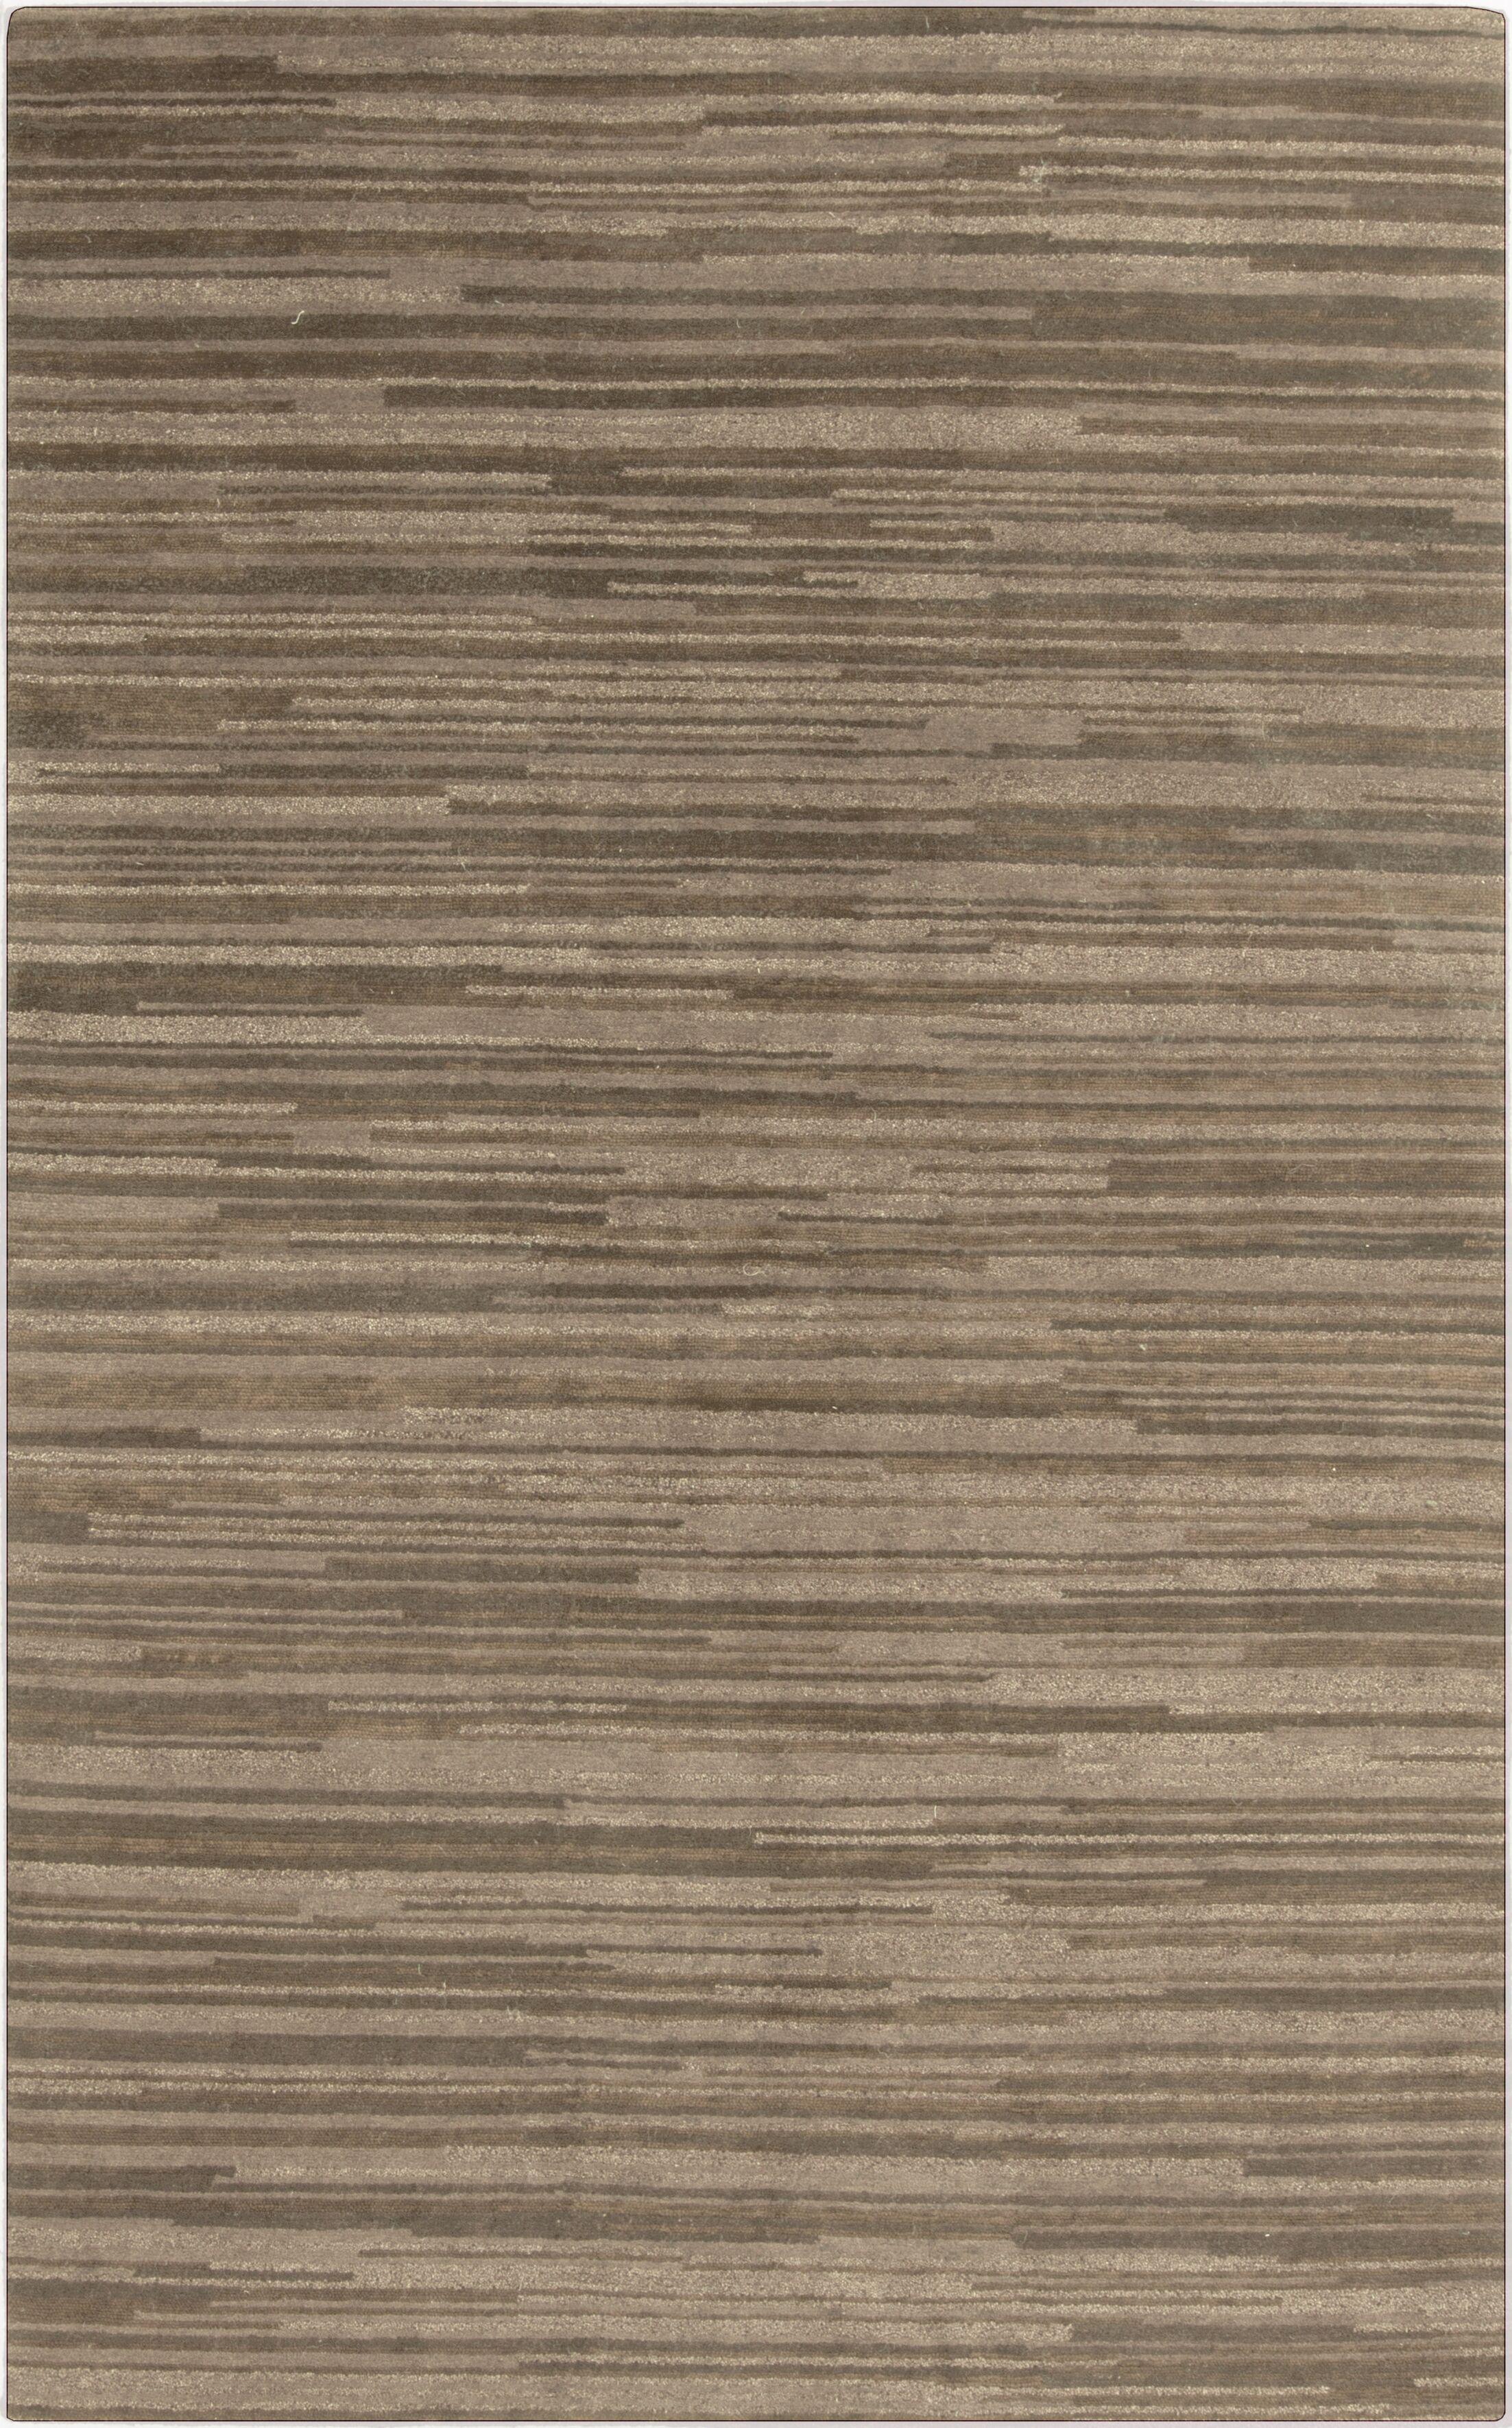 Alica Beige Stripe Area Rug Rug Size: Rectangle 5' x 8'